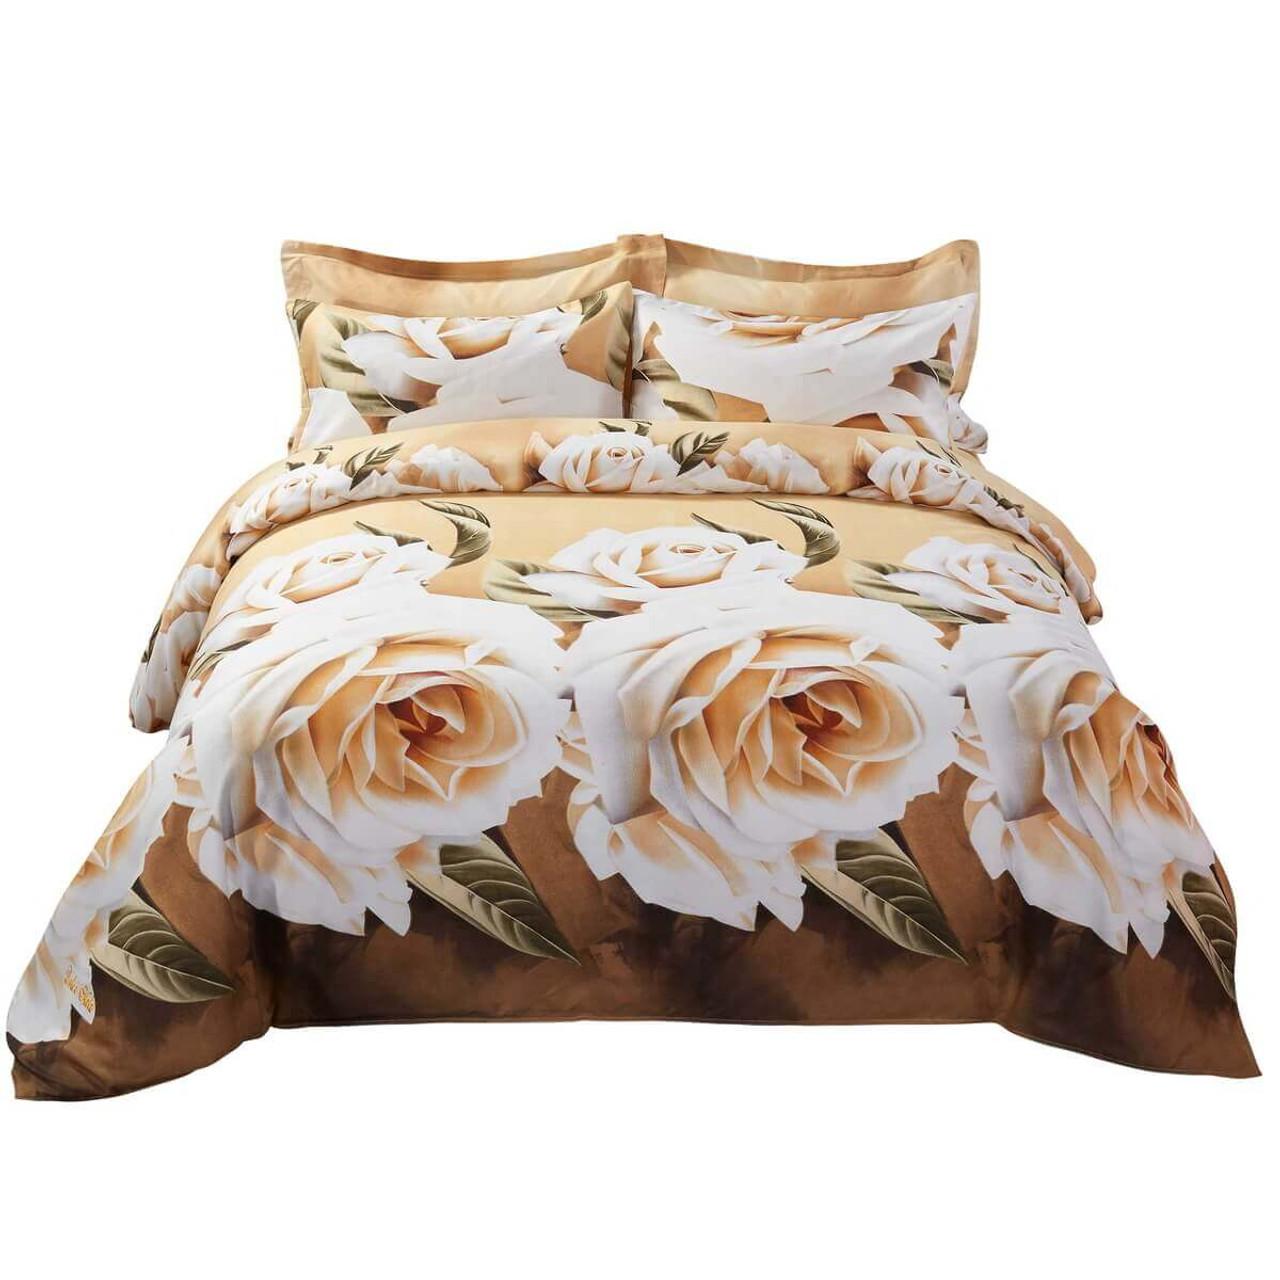 DM710K Drop-shipping Wholesale Bedding Sets